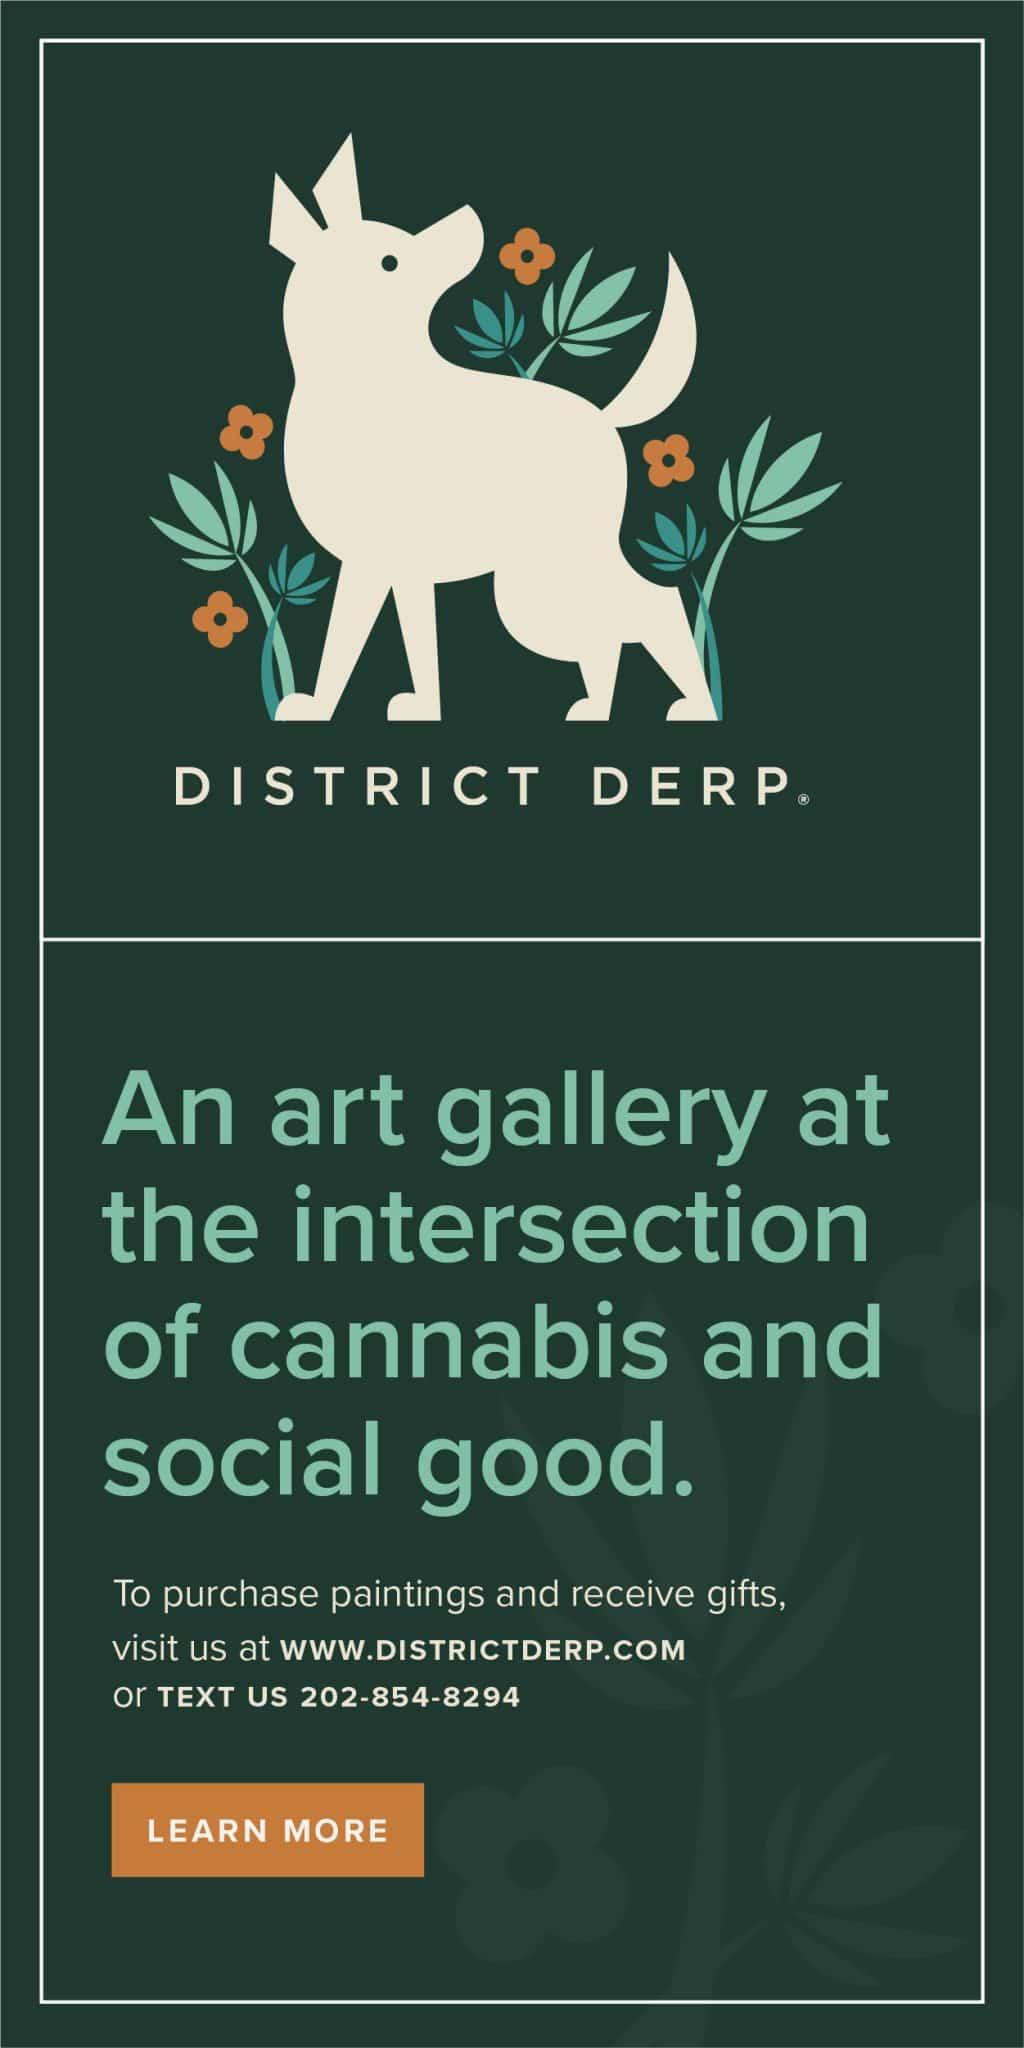 Digital advertisement design for District Derp